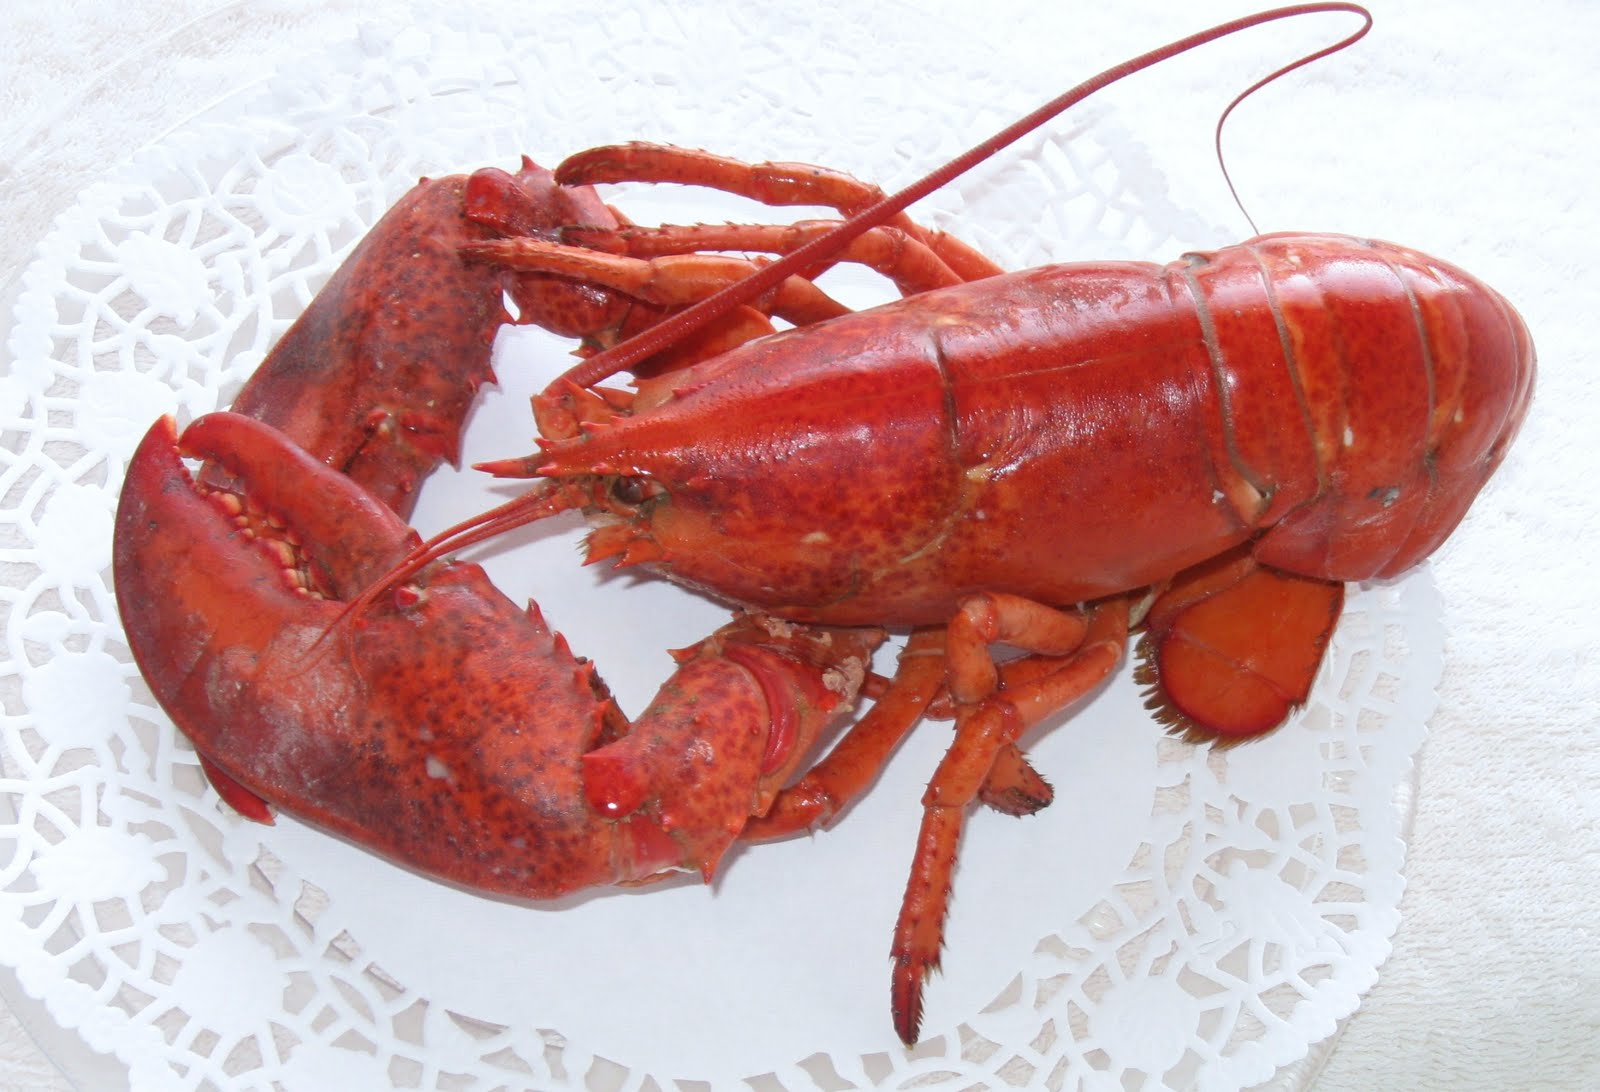 Marvelous-Canada: Lobster Season in Nova Scotia